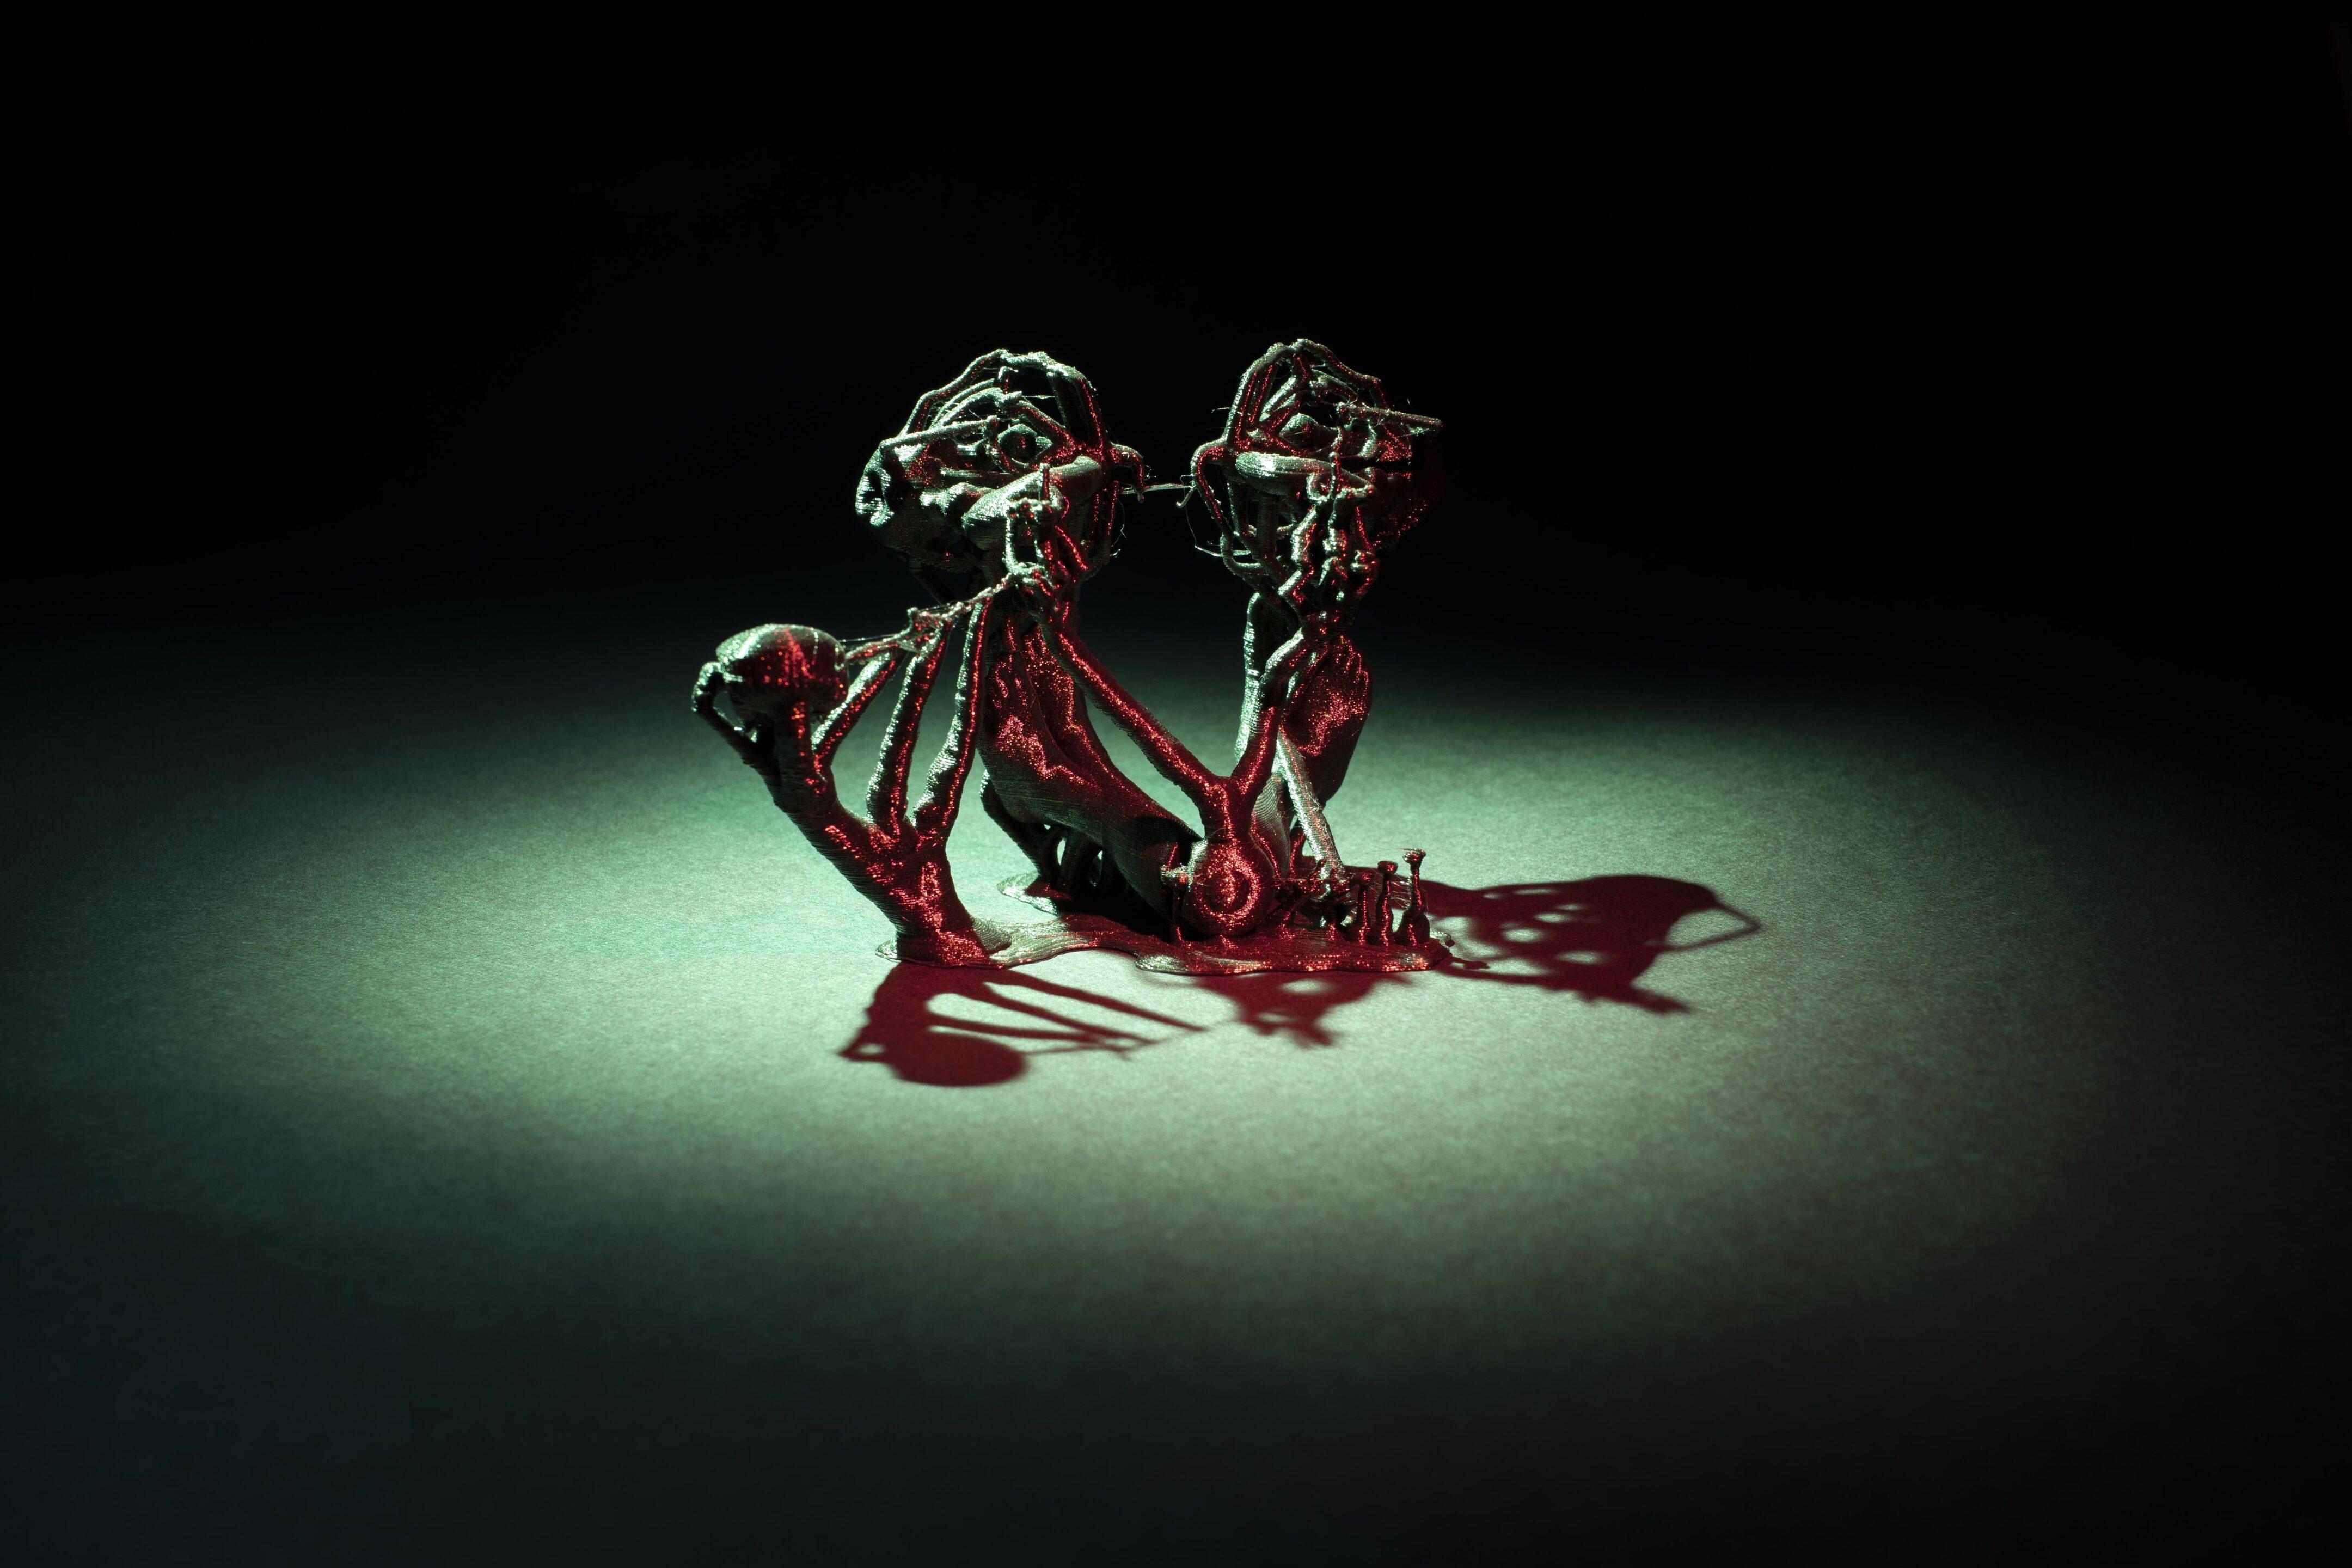 Monster aus dem 3D Drucker